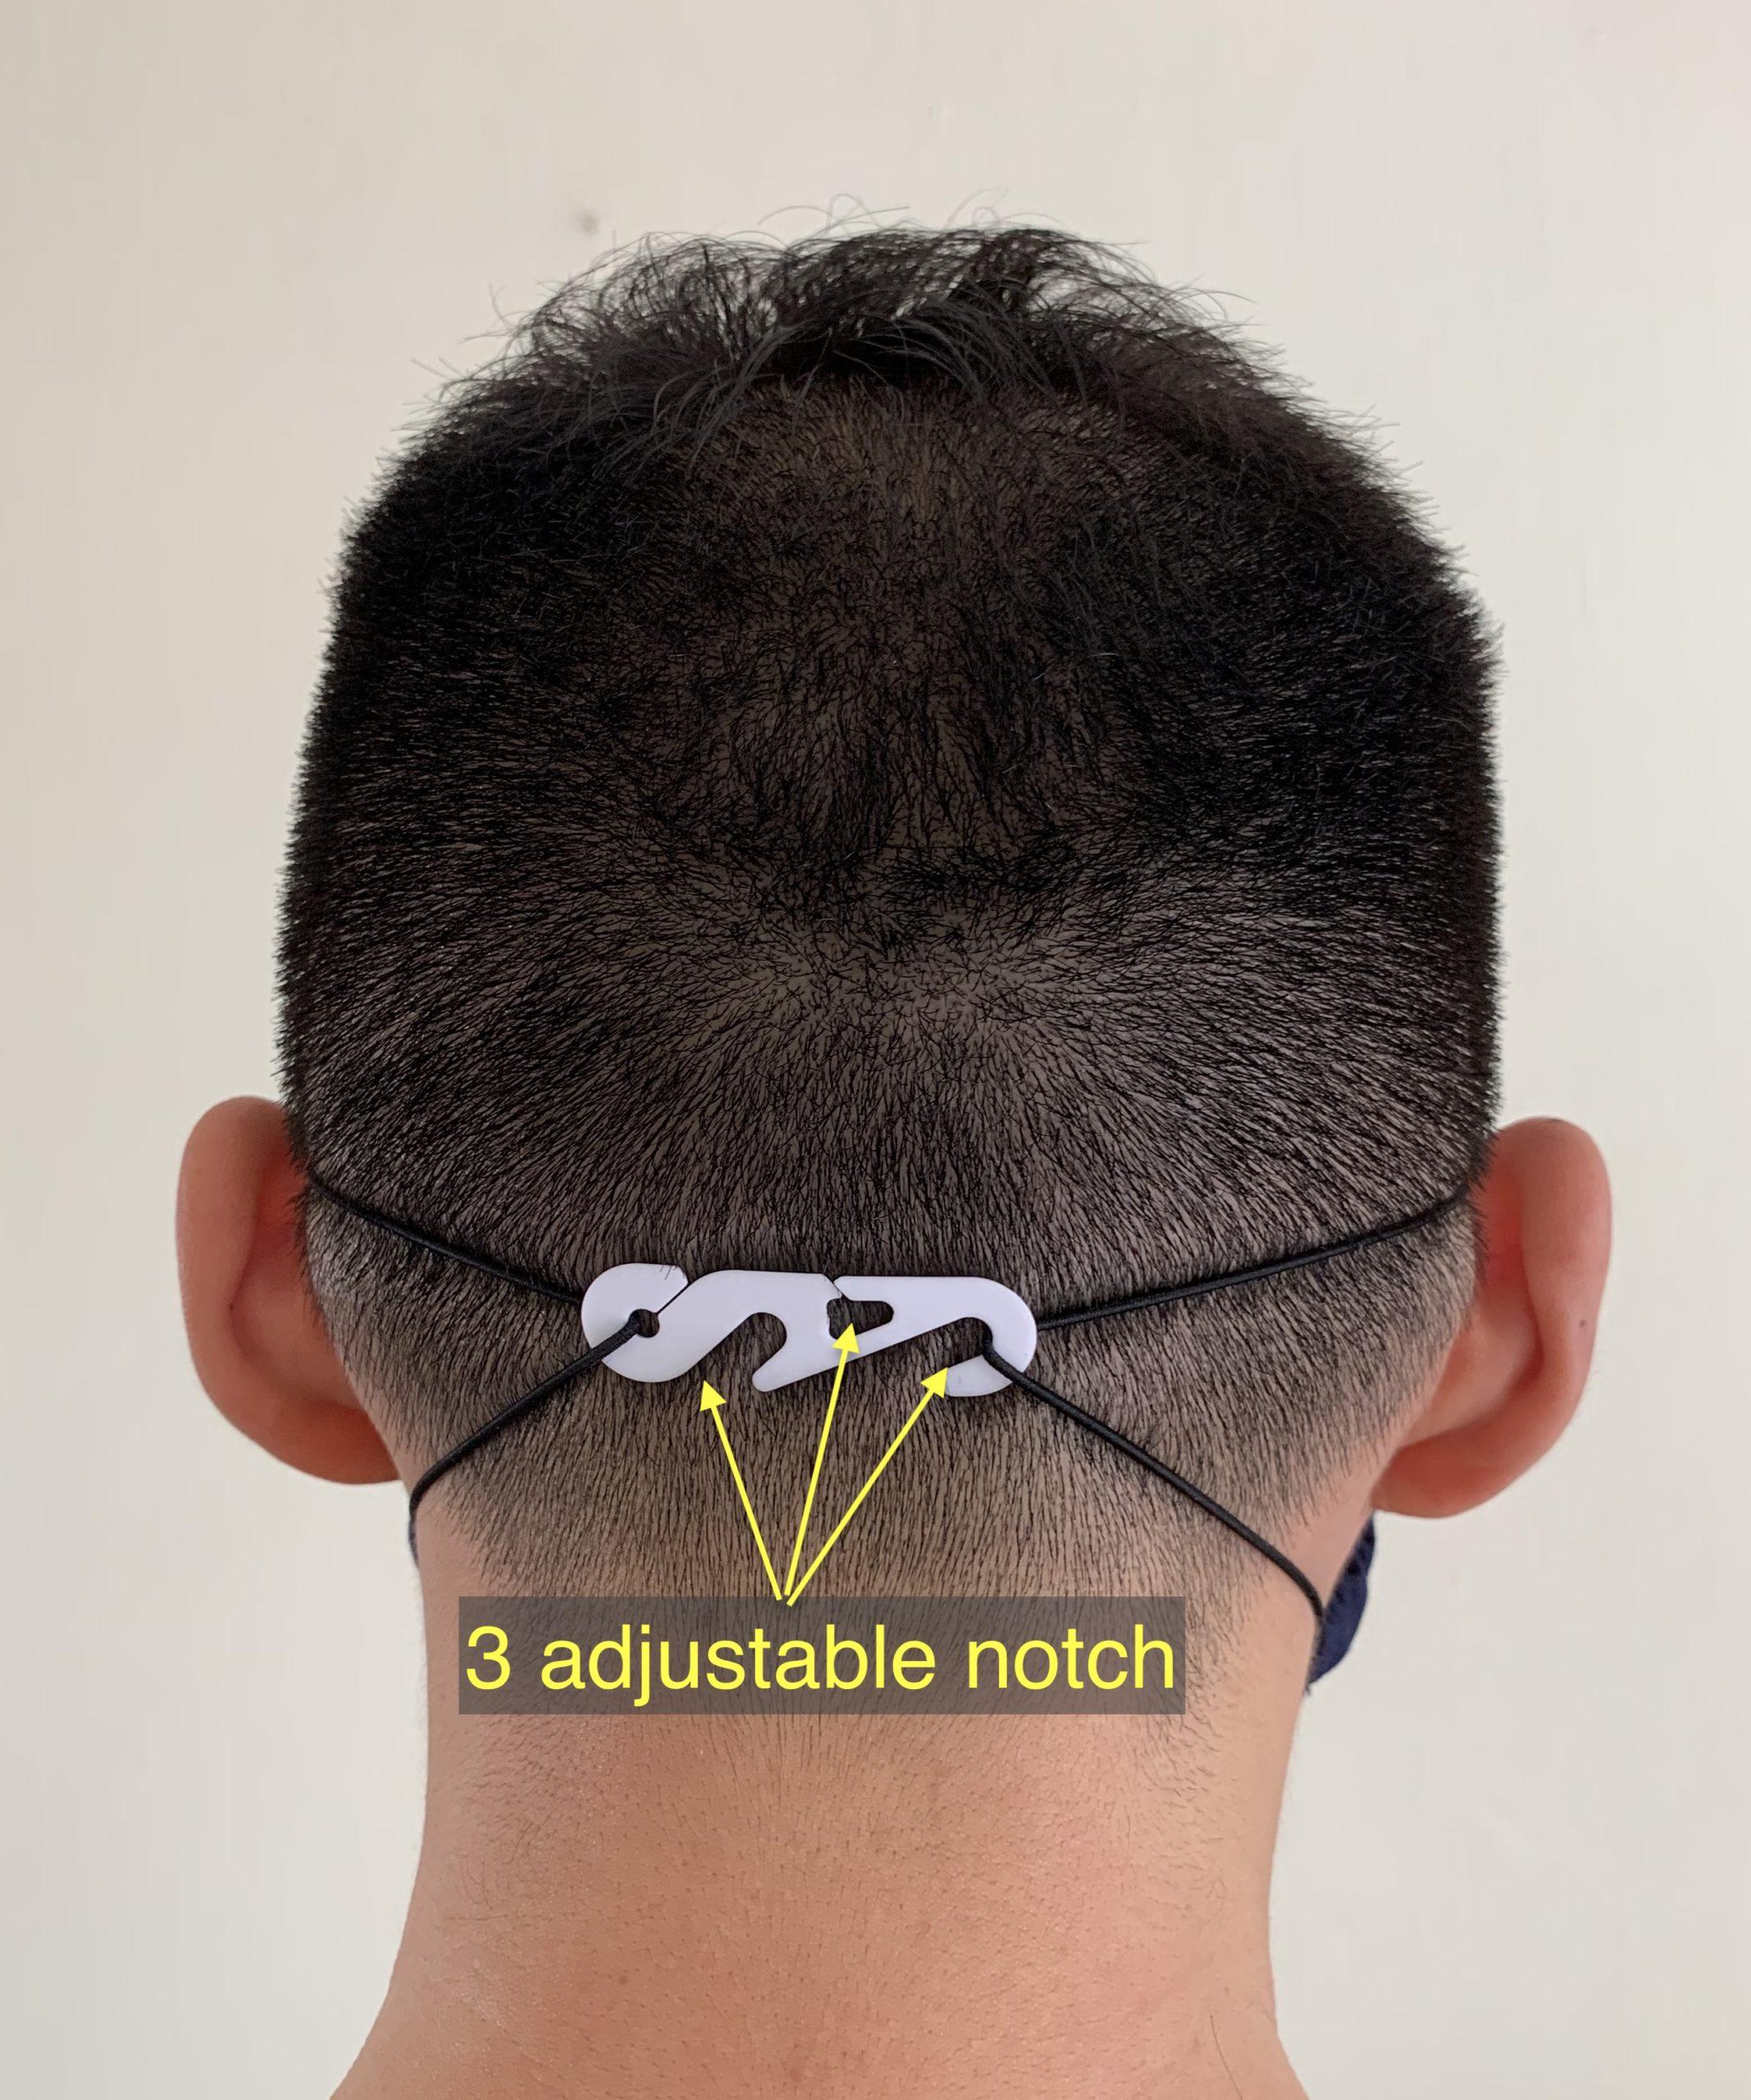 Long clip explaining adjustable notch